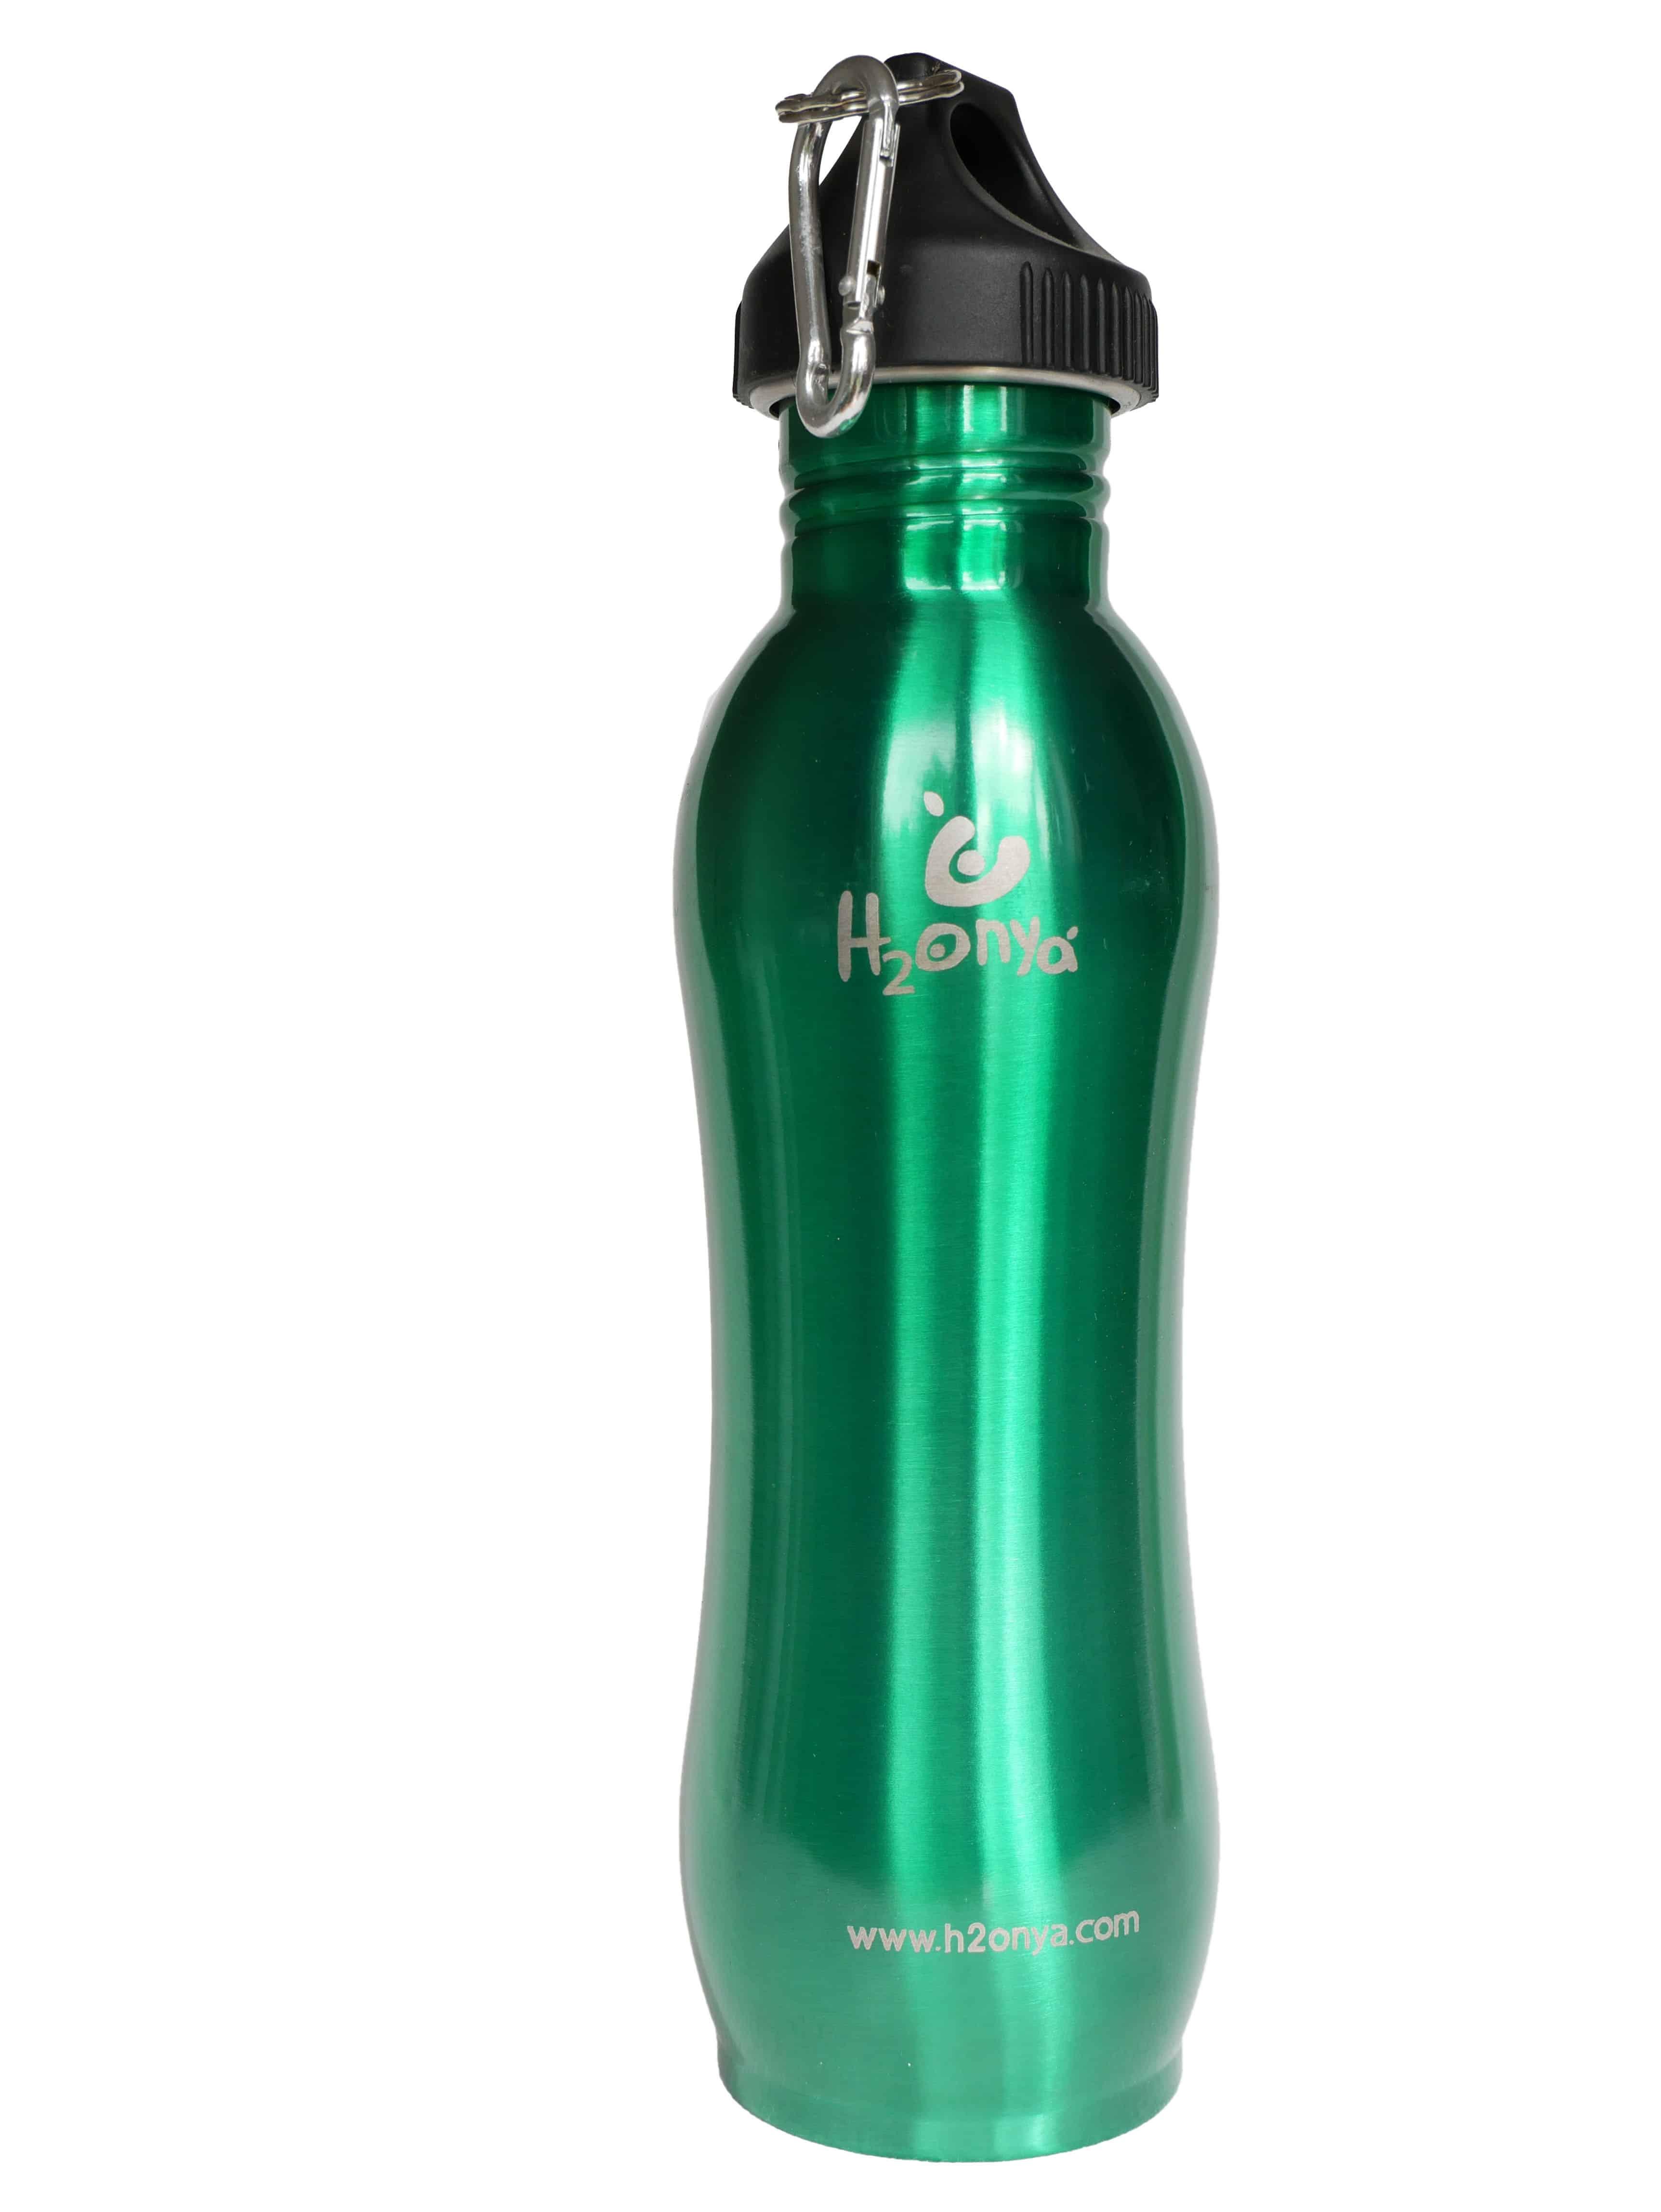 H2Onya Stainless Steel Water Bottle 750ml – Mint Green